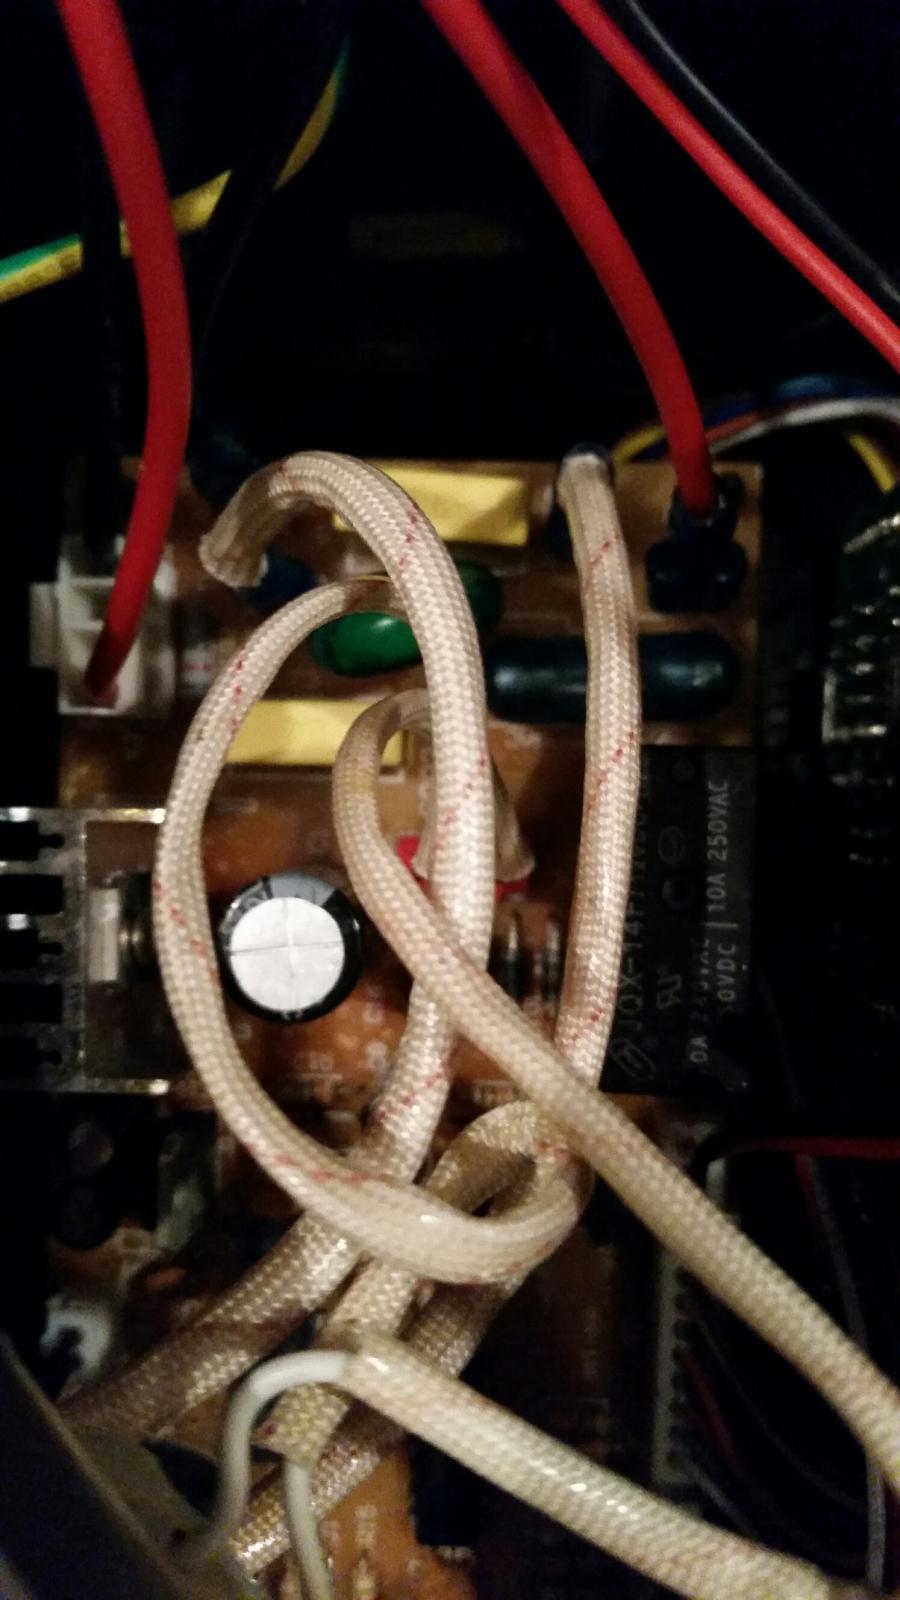 Bypassing fridge thermostat  How?   HomeBrewTalk com - Beer